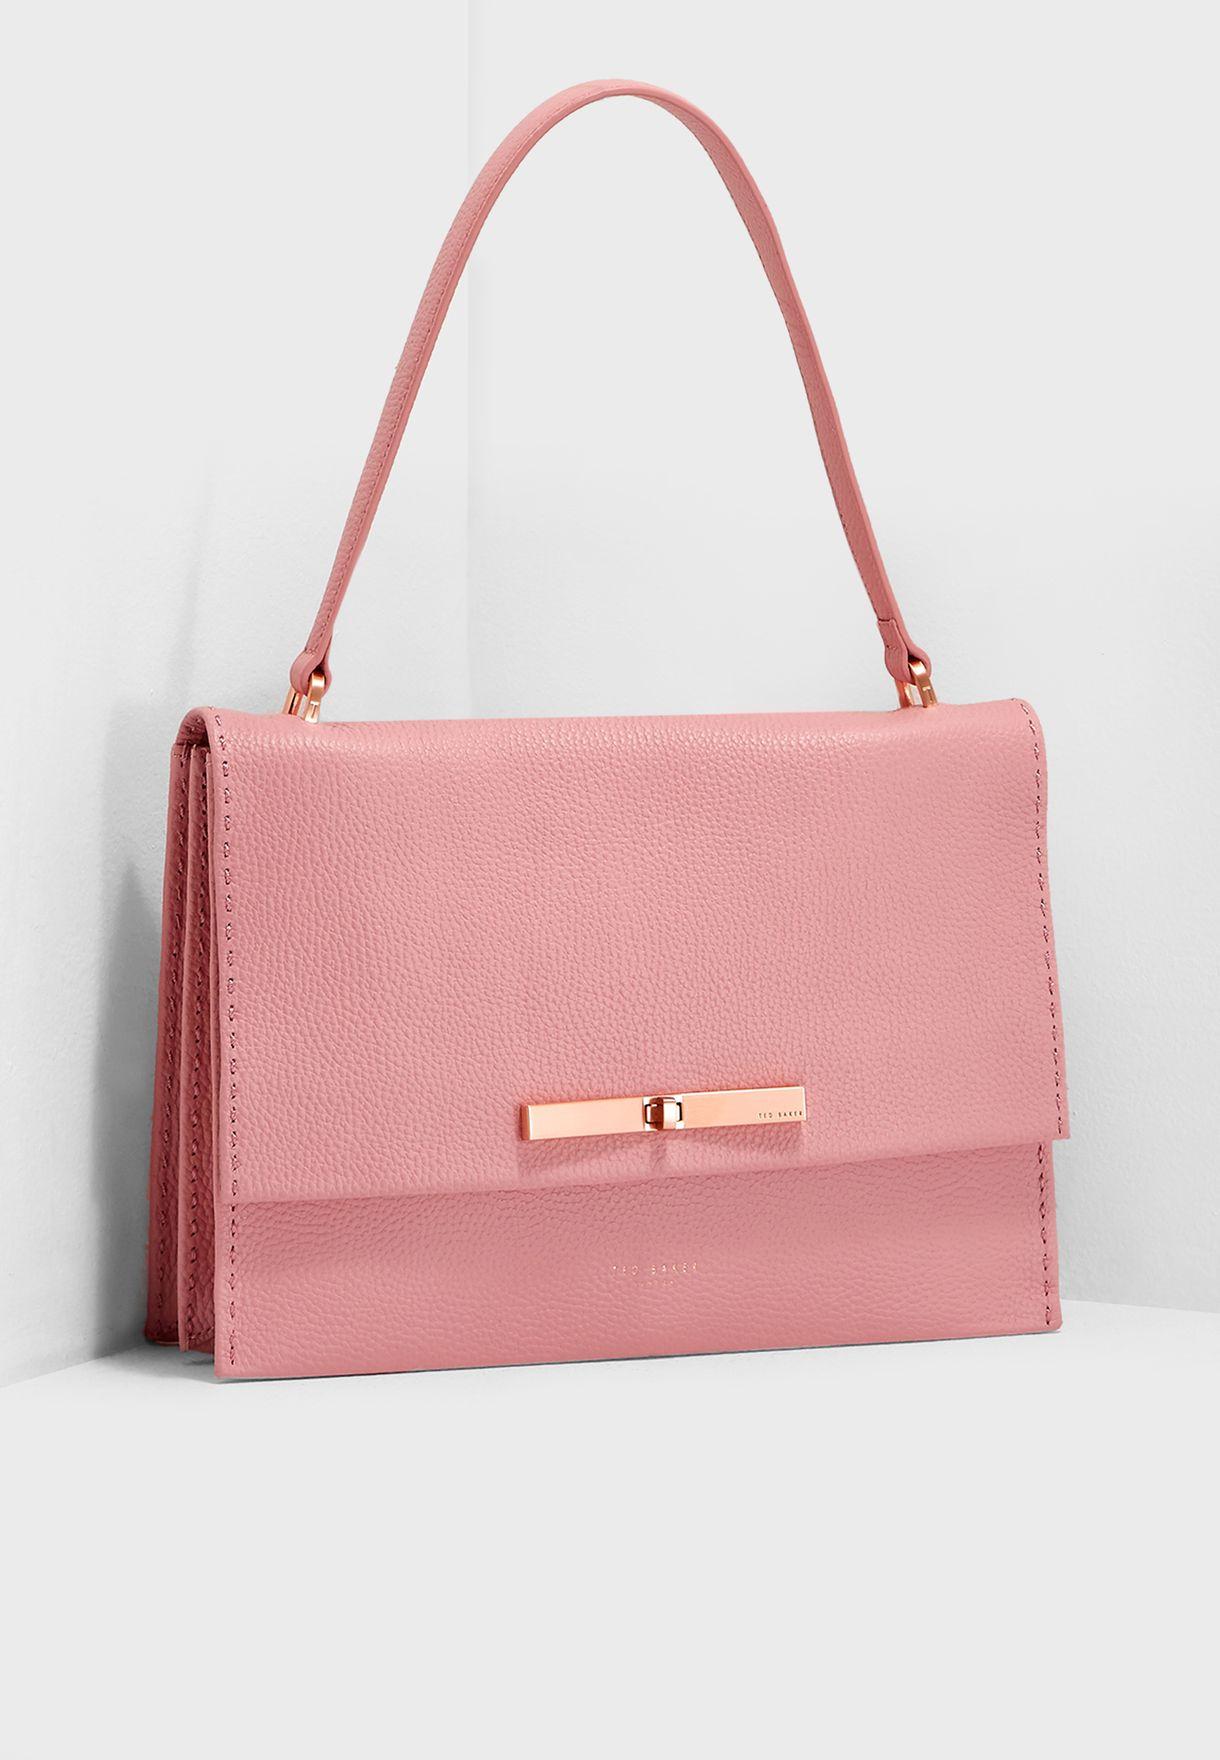 abdcd6814055 Shop Ted baker pink Jessi Concertina Satchel 147546 for Women in Saudi -  TE456AC58XZT